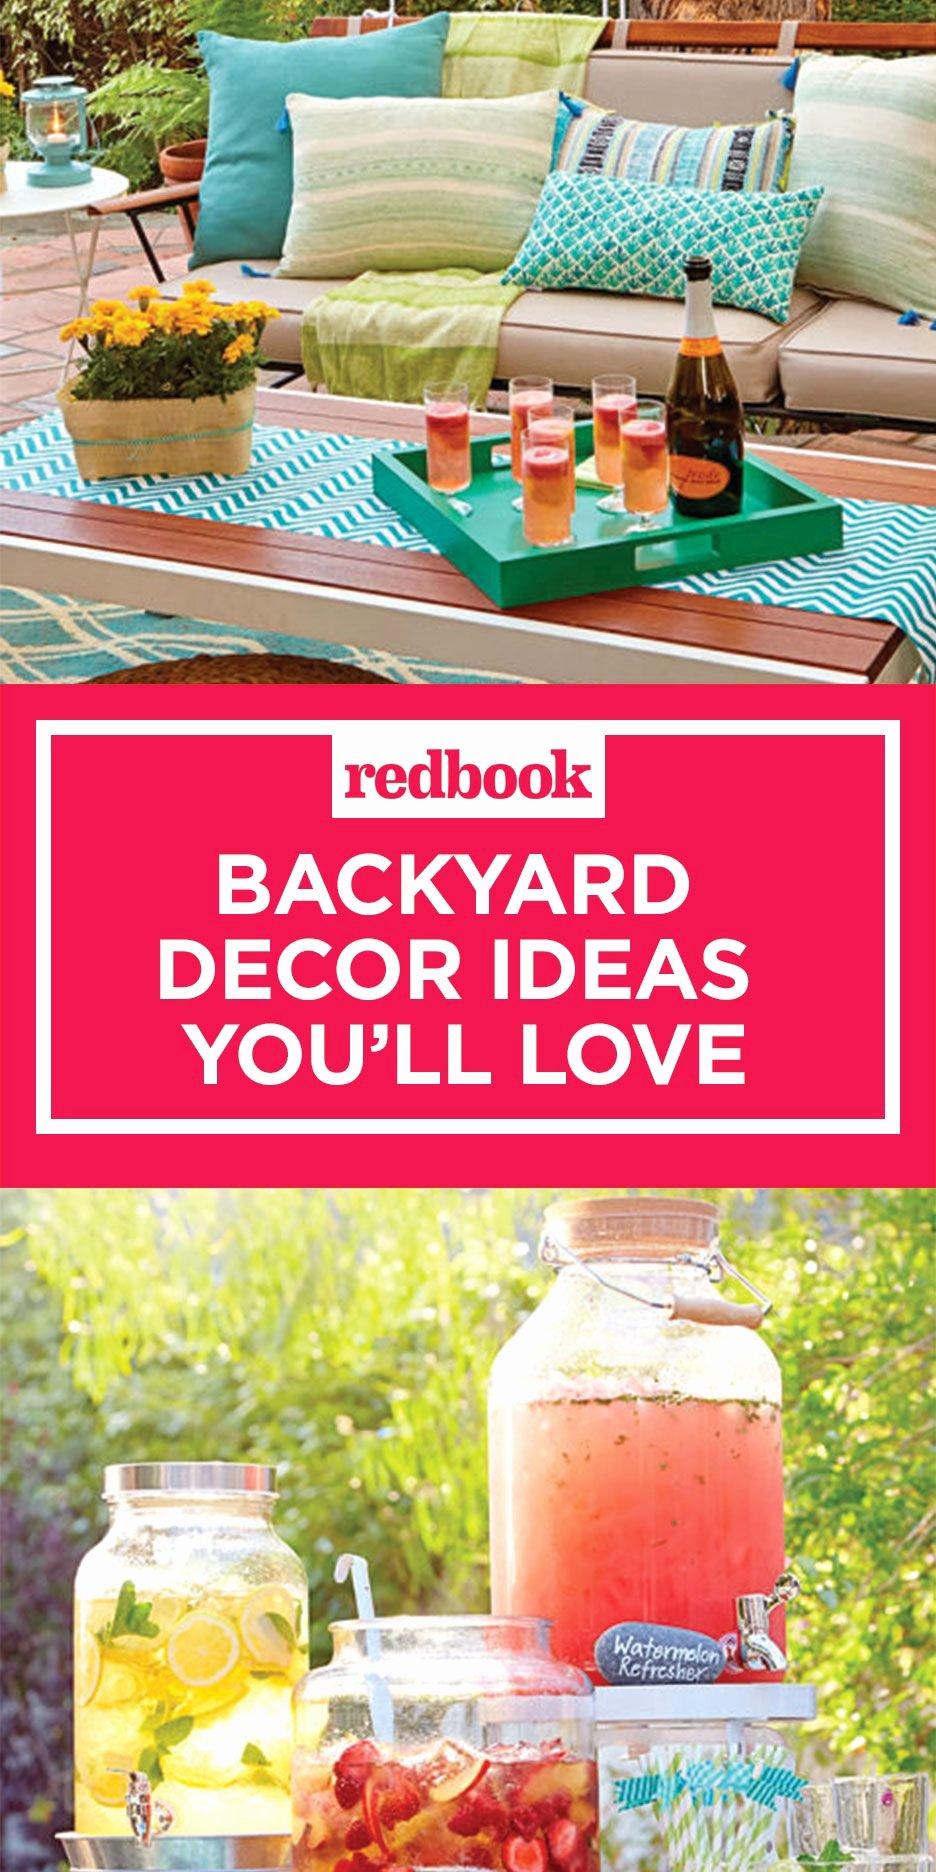 Backyard Birthday Decoration Ideas Beautiful 14 Best Backyard Party Ideas for Adults Summer